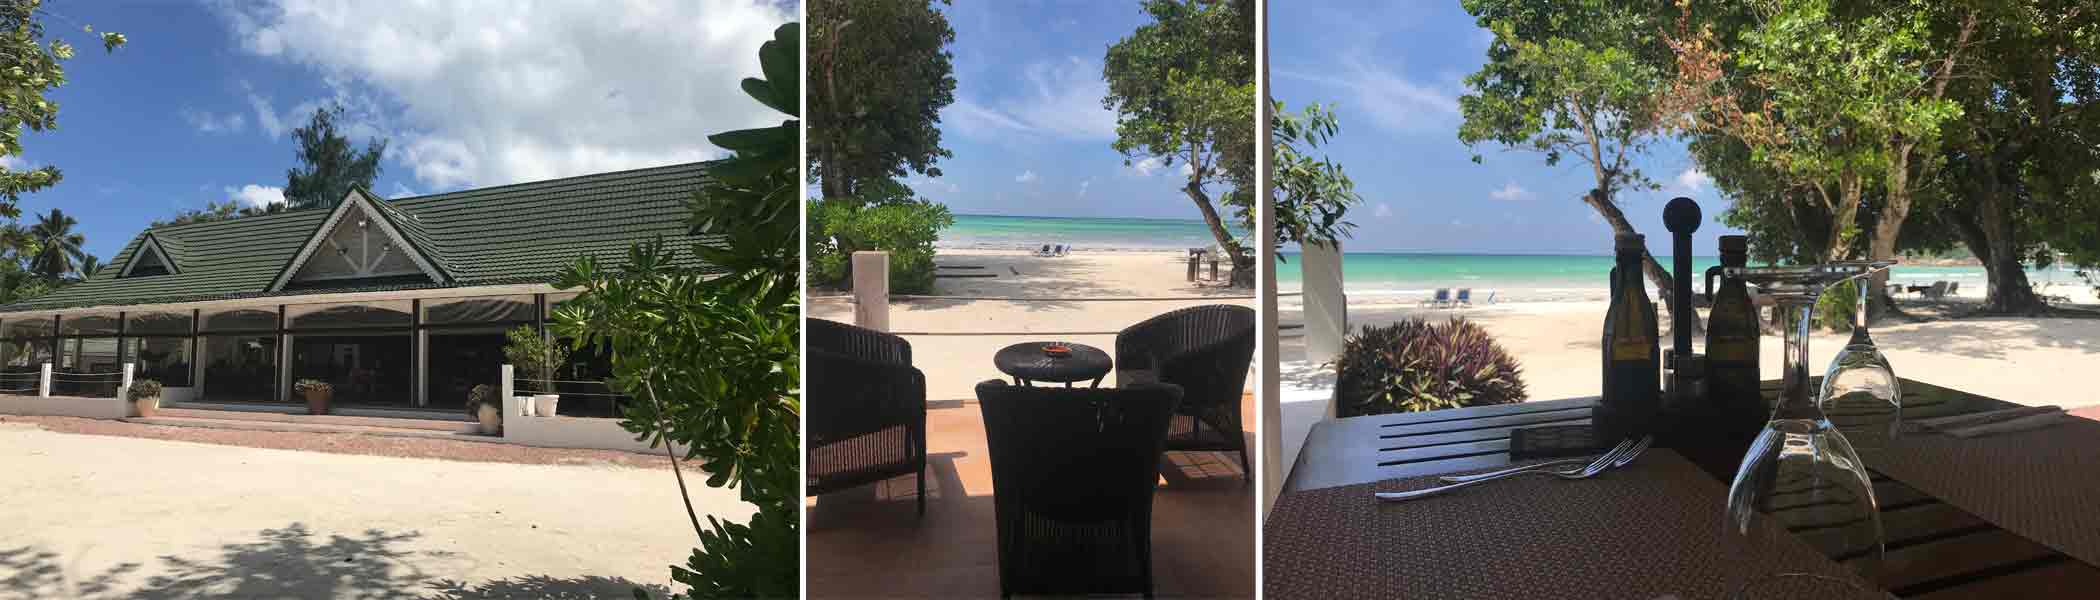 cote-dor-lodge, Bars and restaurants in Seychelles Islands